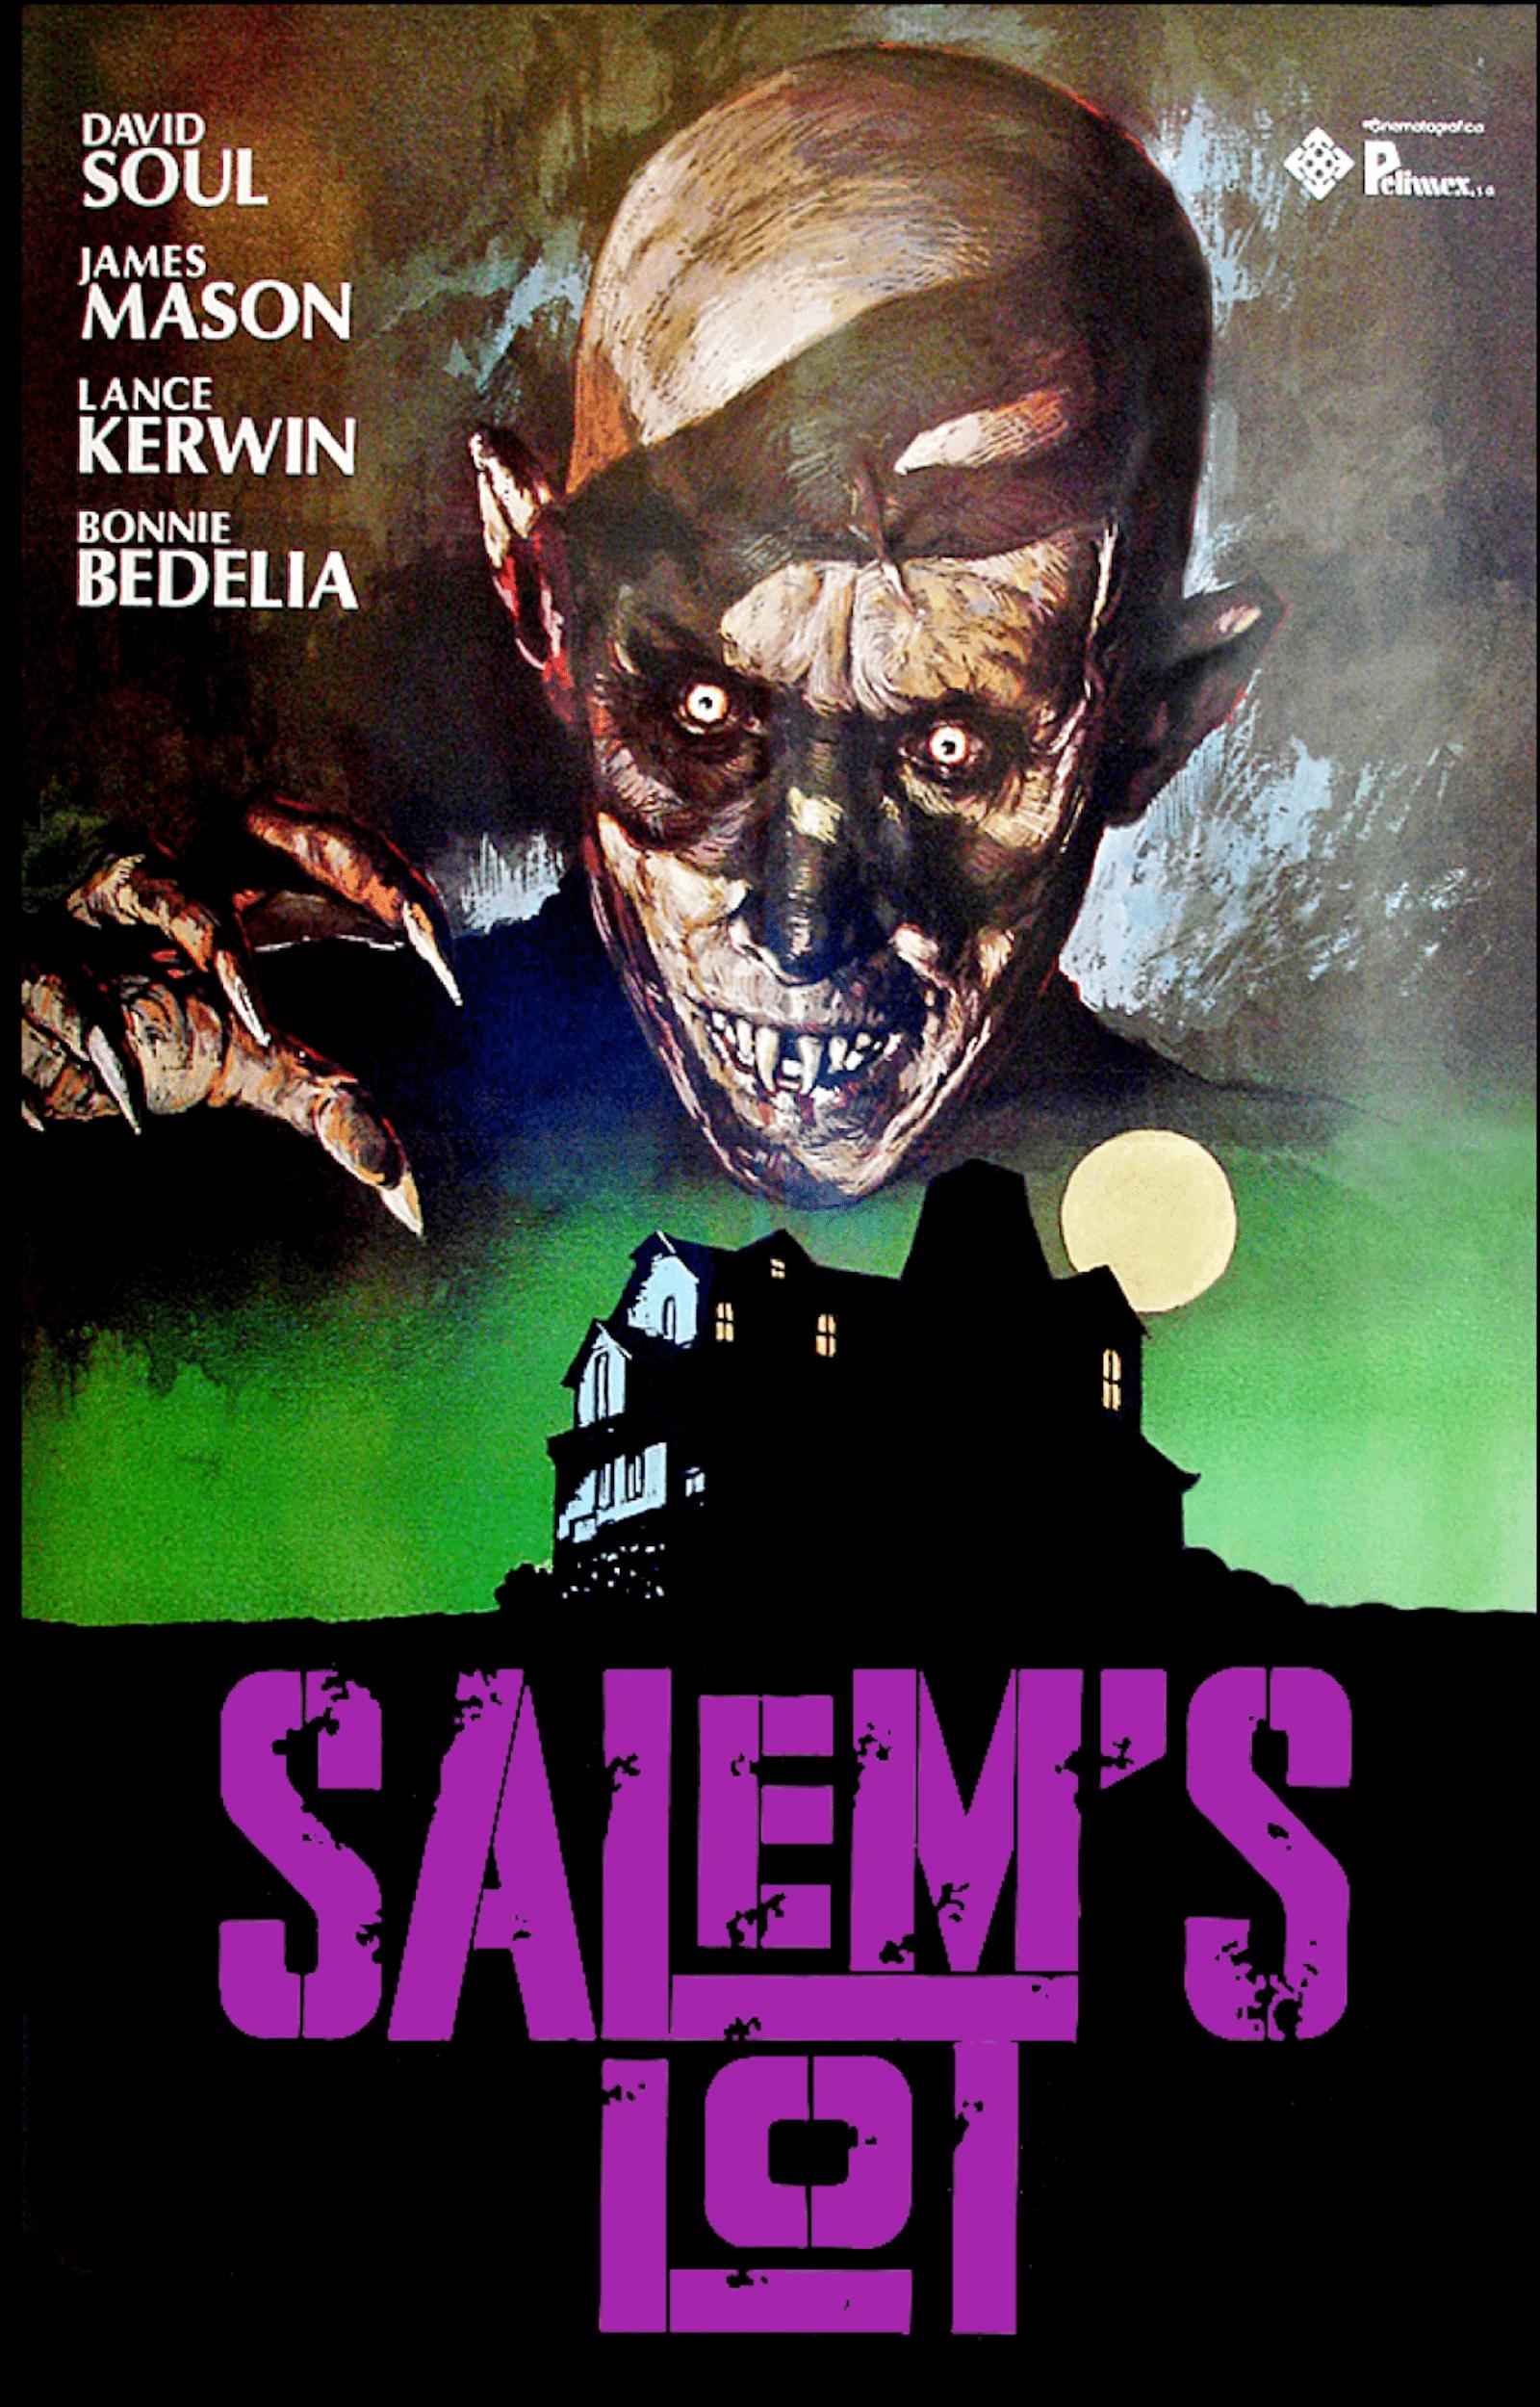 Old Vampire Movie Posters